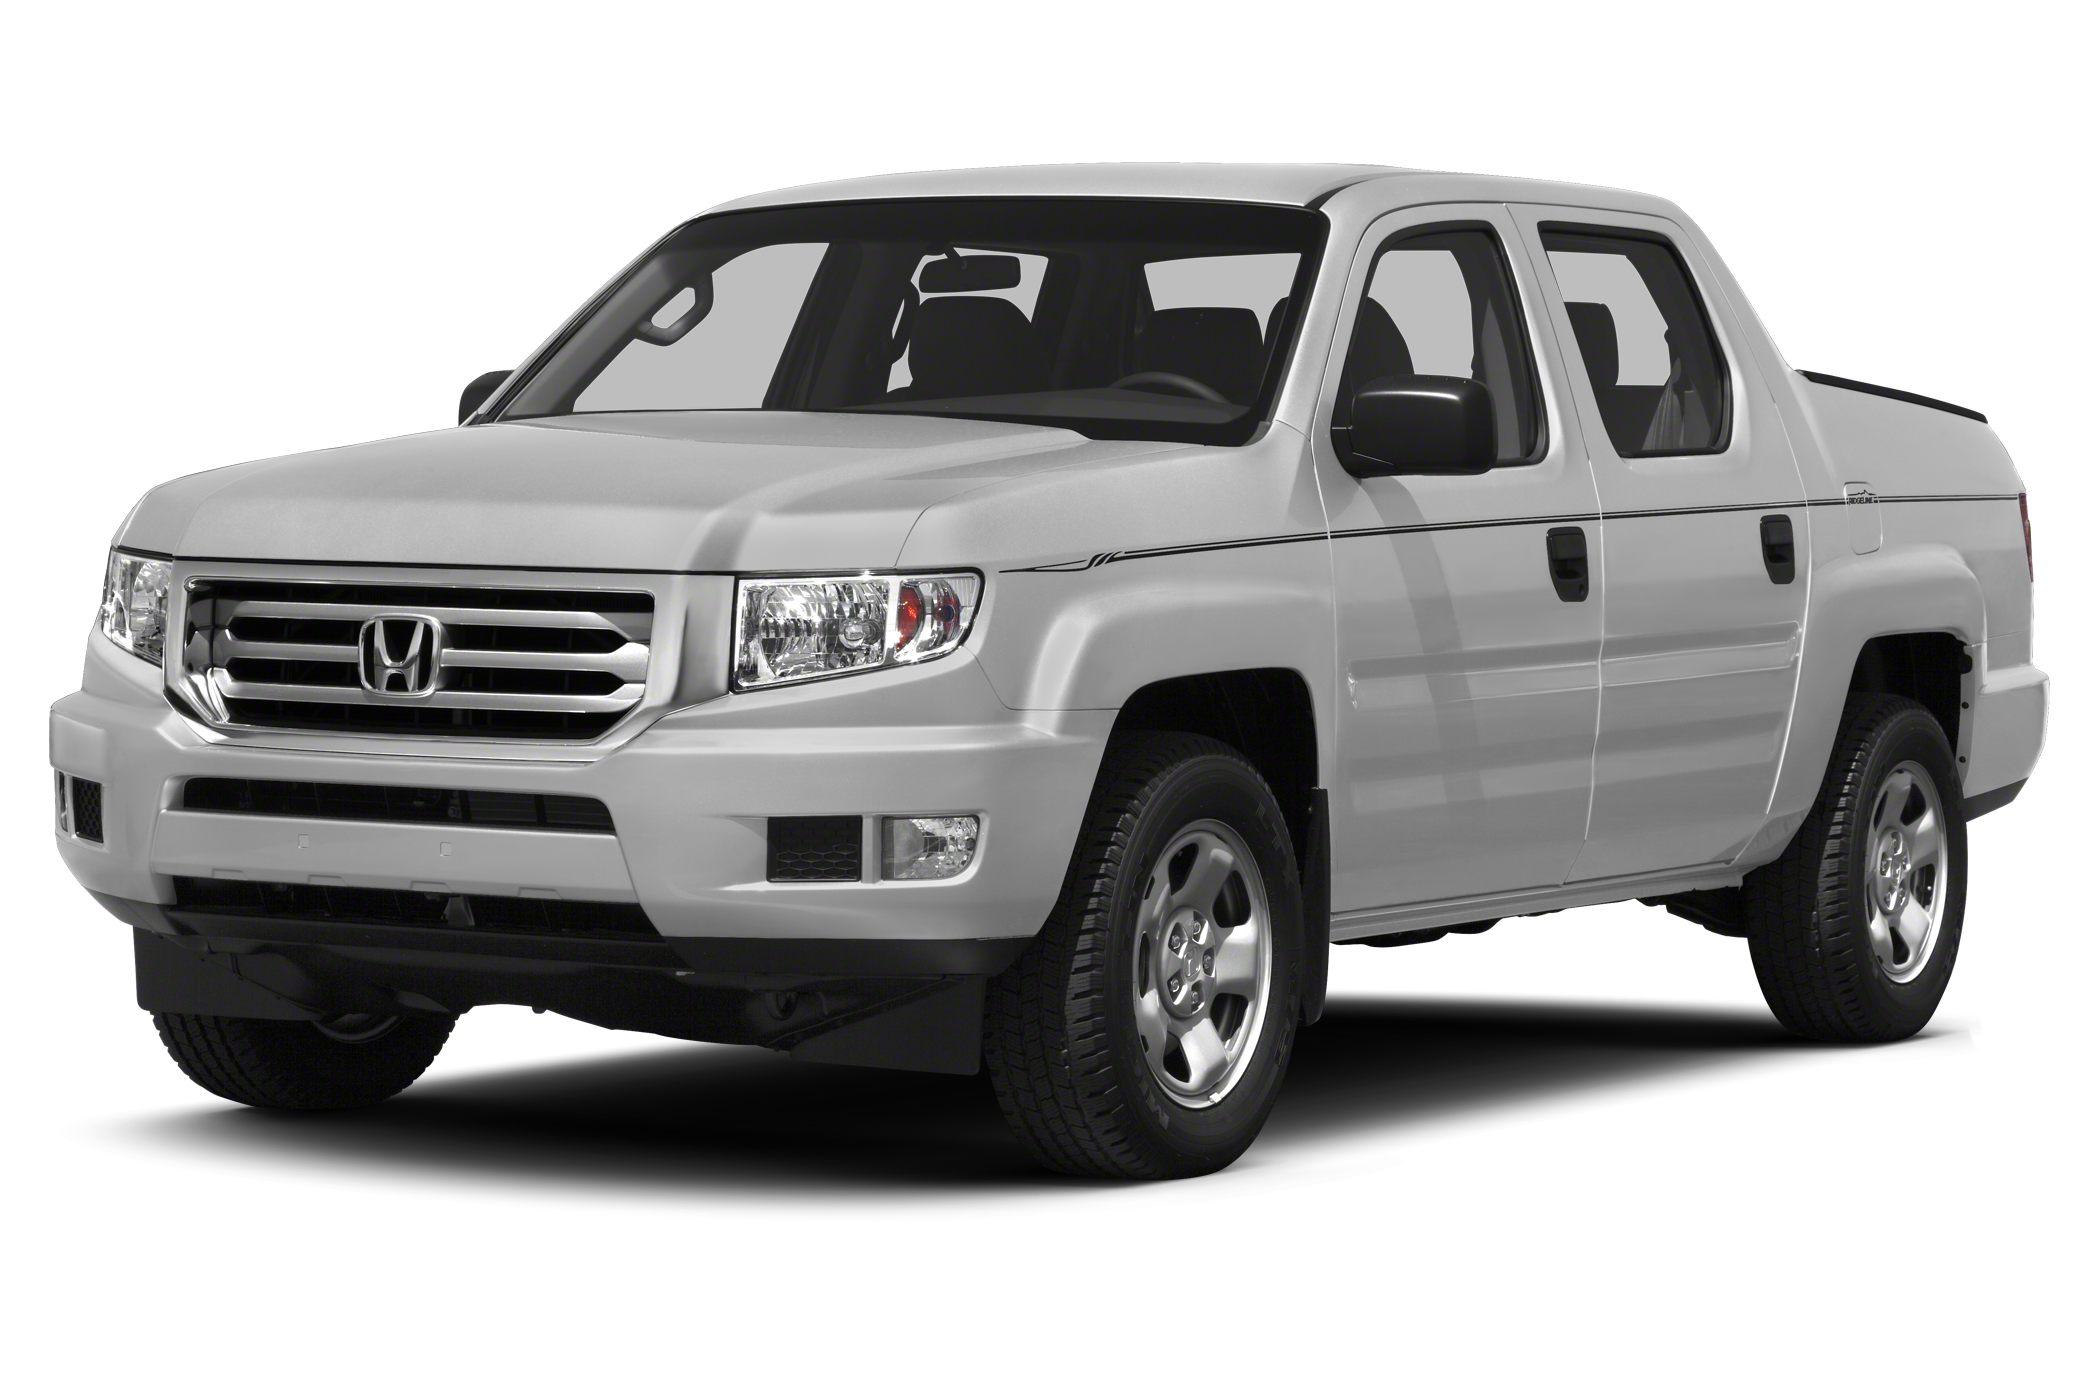 2013 Honda Ridgeline RTL Crew Cab Pickup for sale in Alcoa for $33,990 with 17,435 miles.